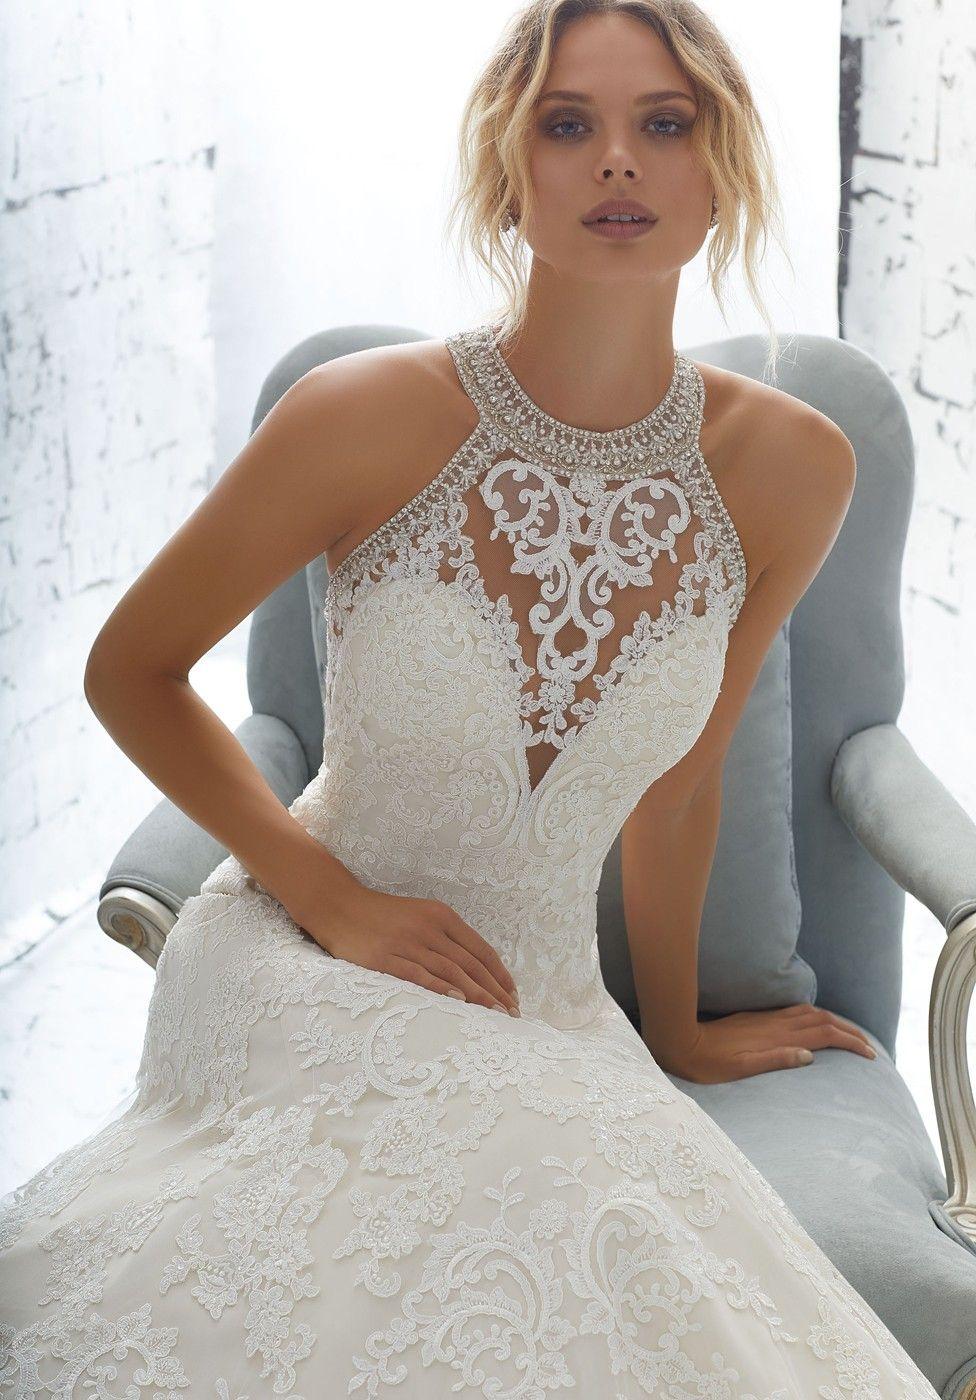 Mori Lee Angelina Faccenda  Kailani High Neck Bridal Dress